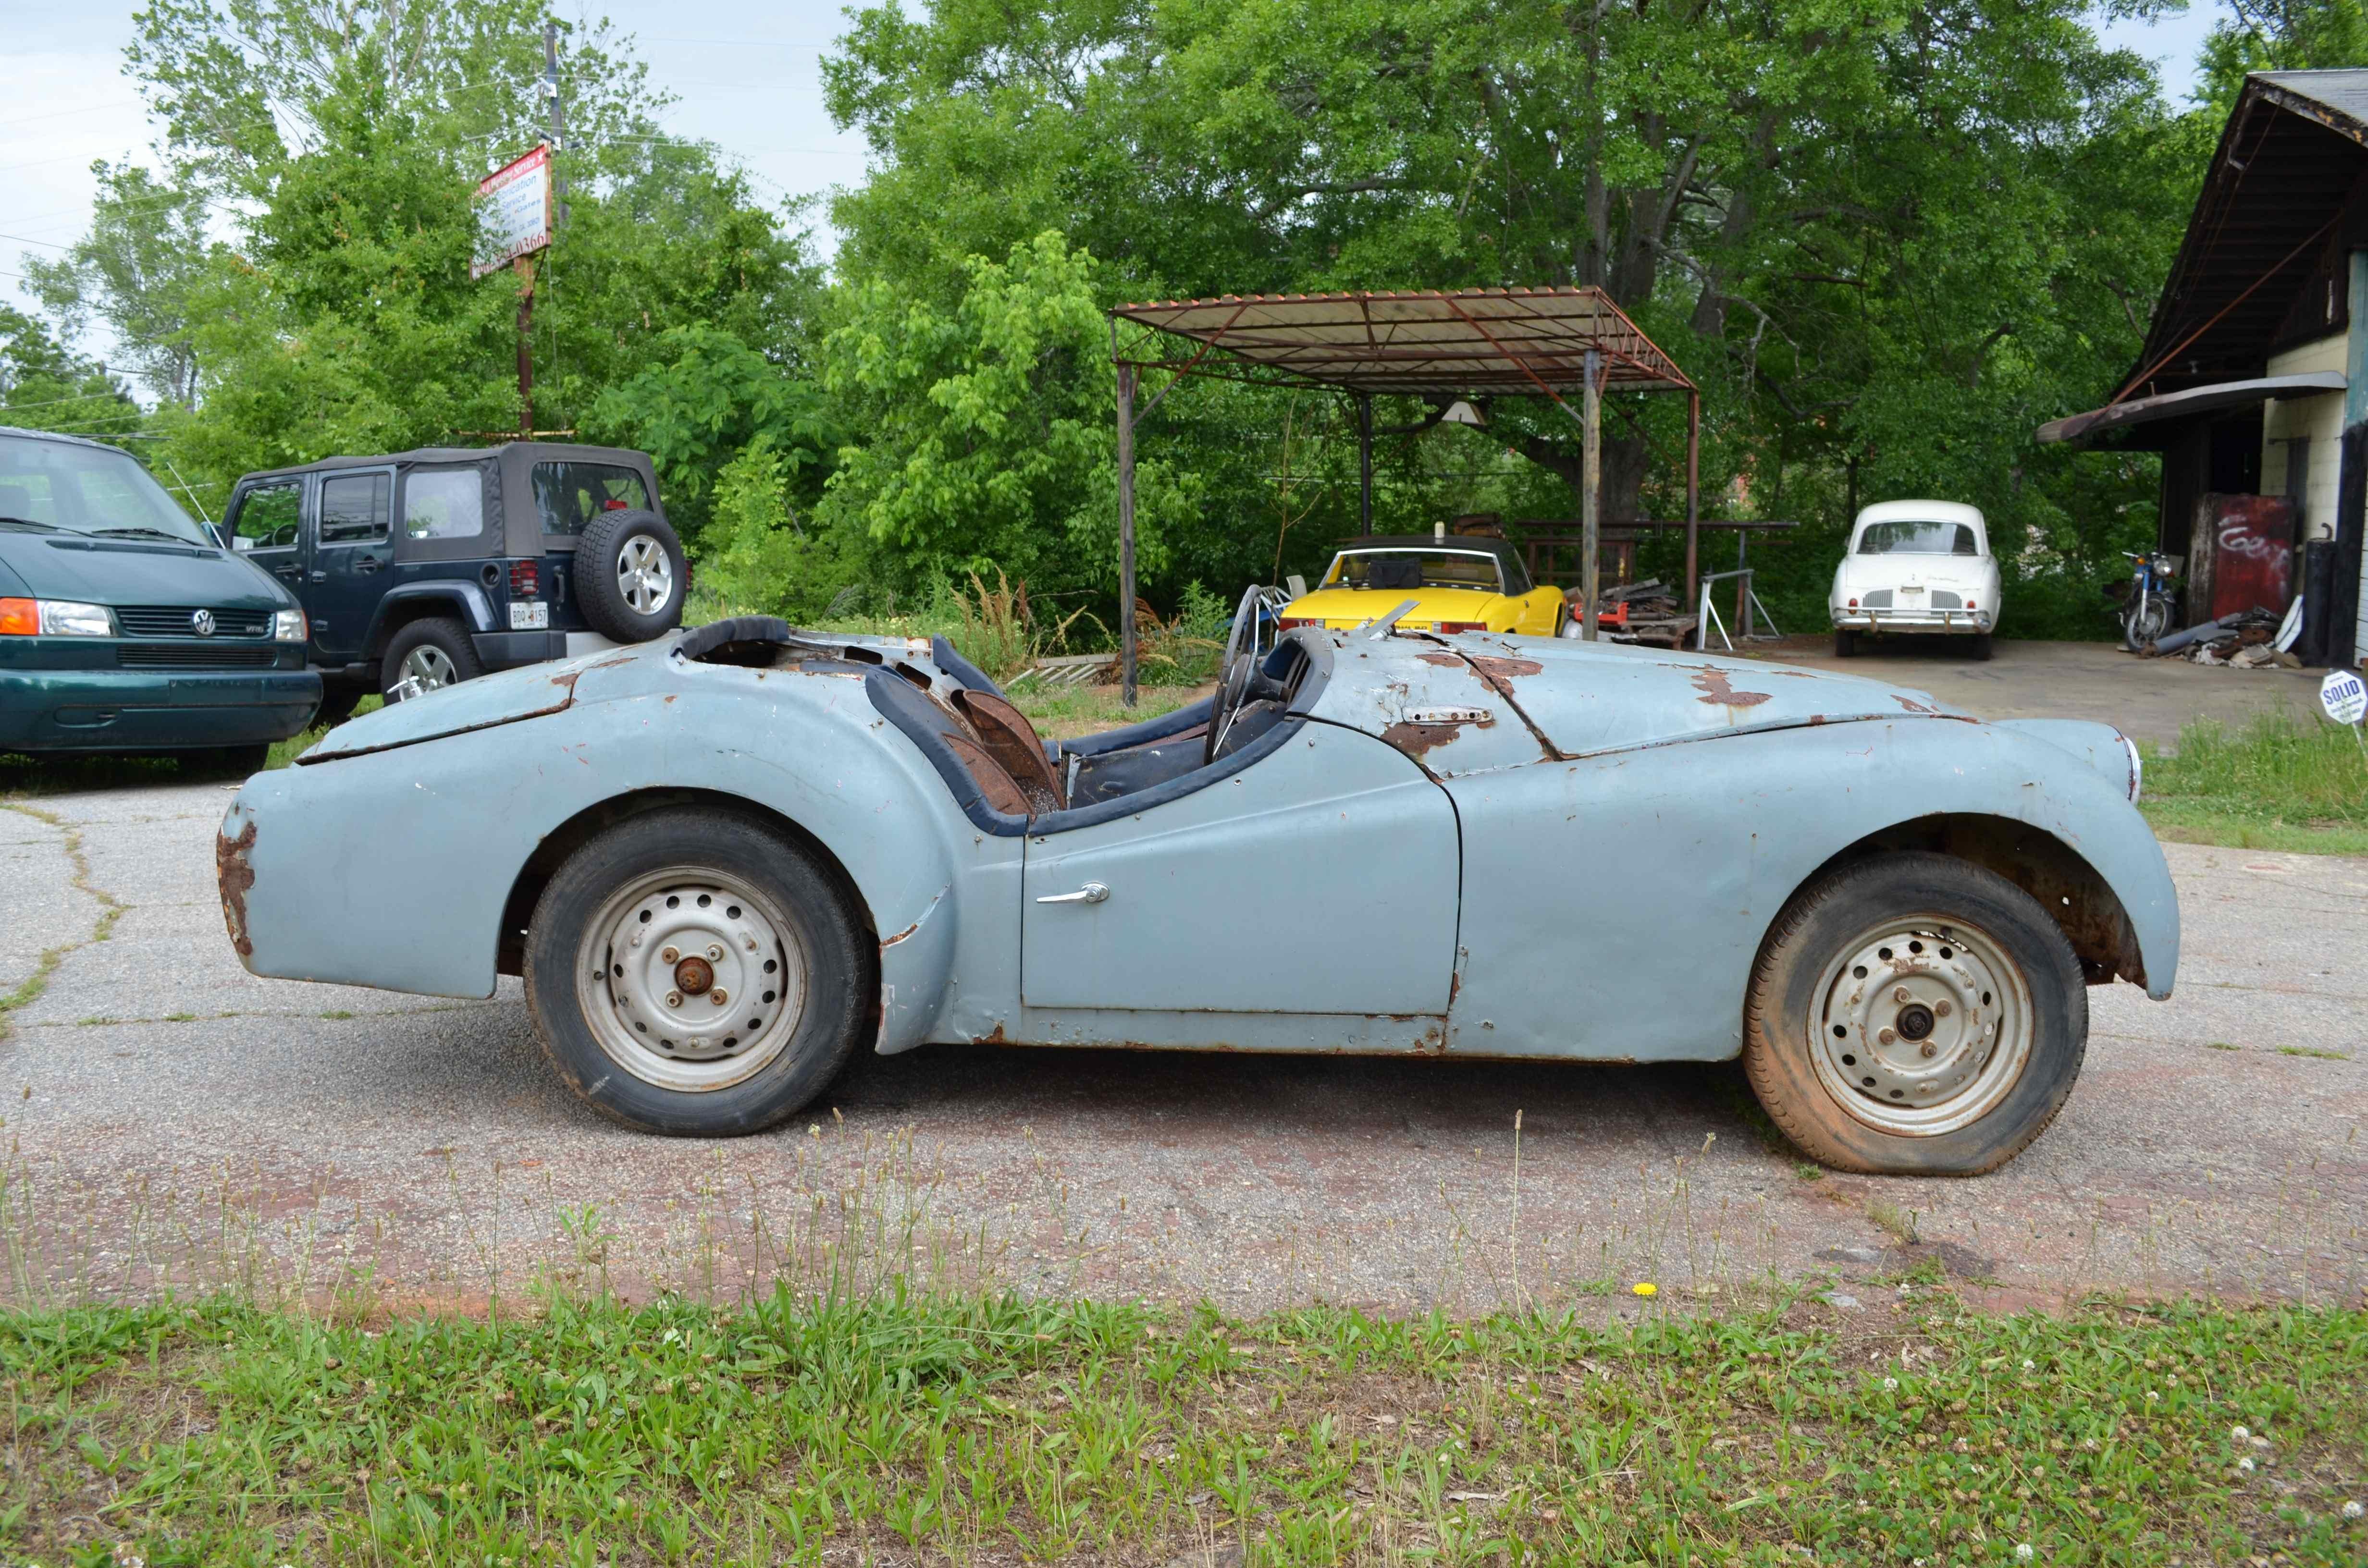 1958 Triumph Tr3a Project Car For Sale: Rolling Chassis For Resto: 1958 Triumph TR3A